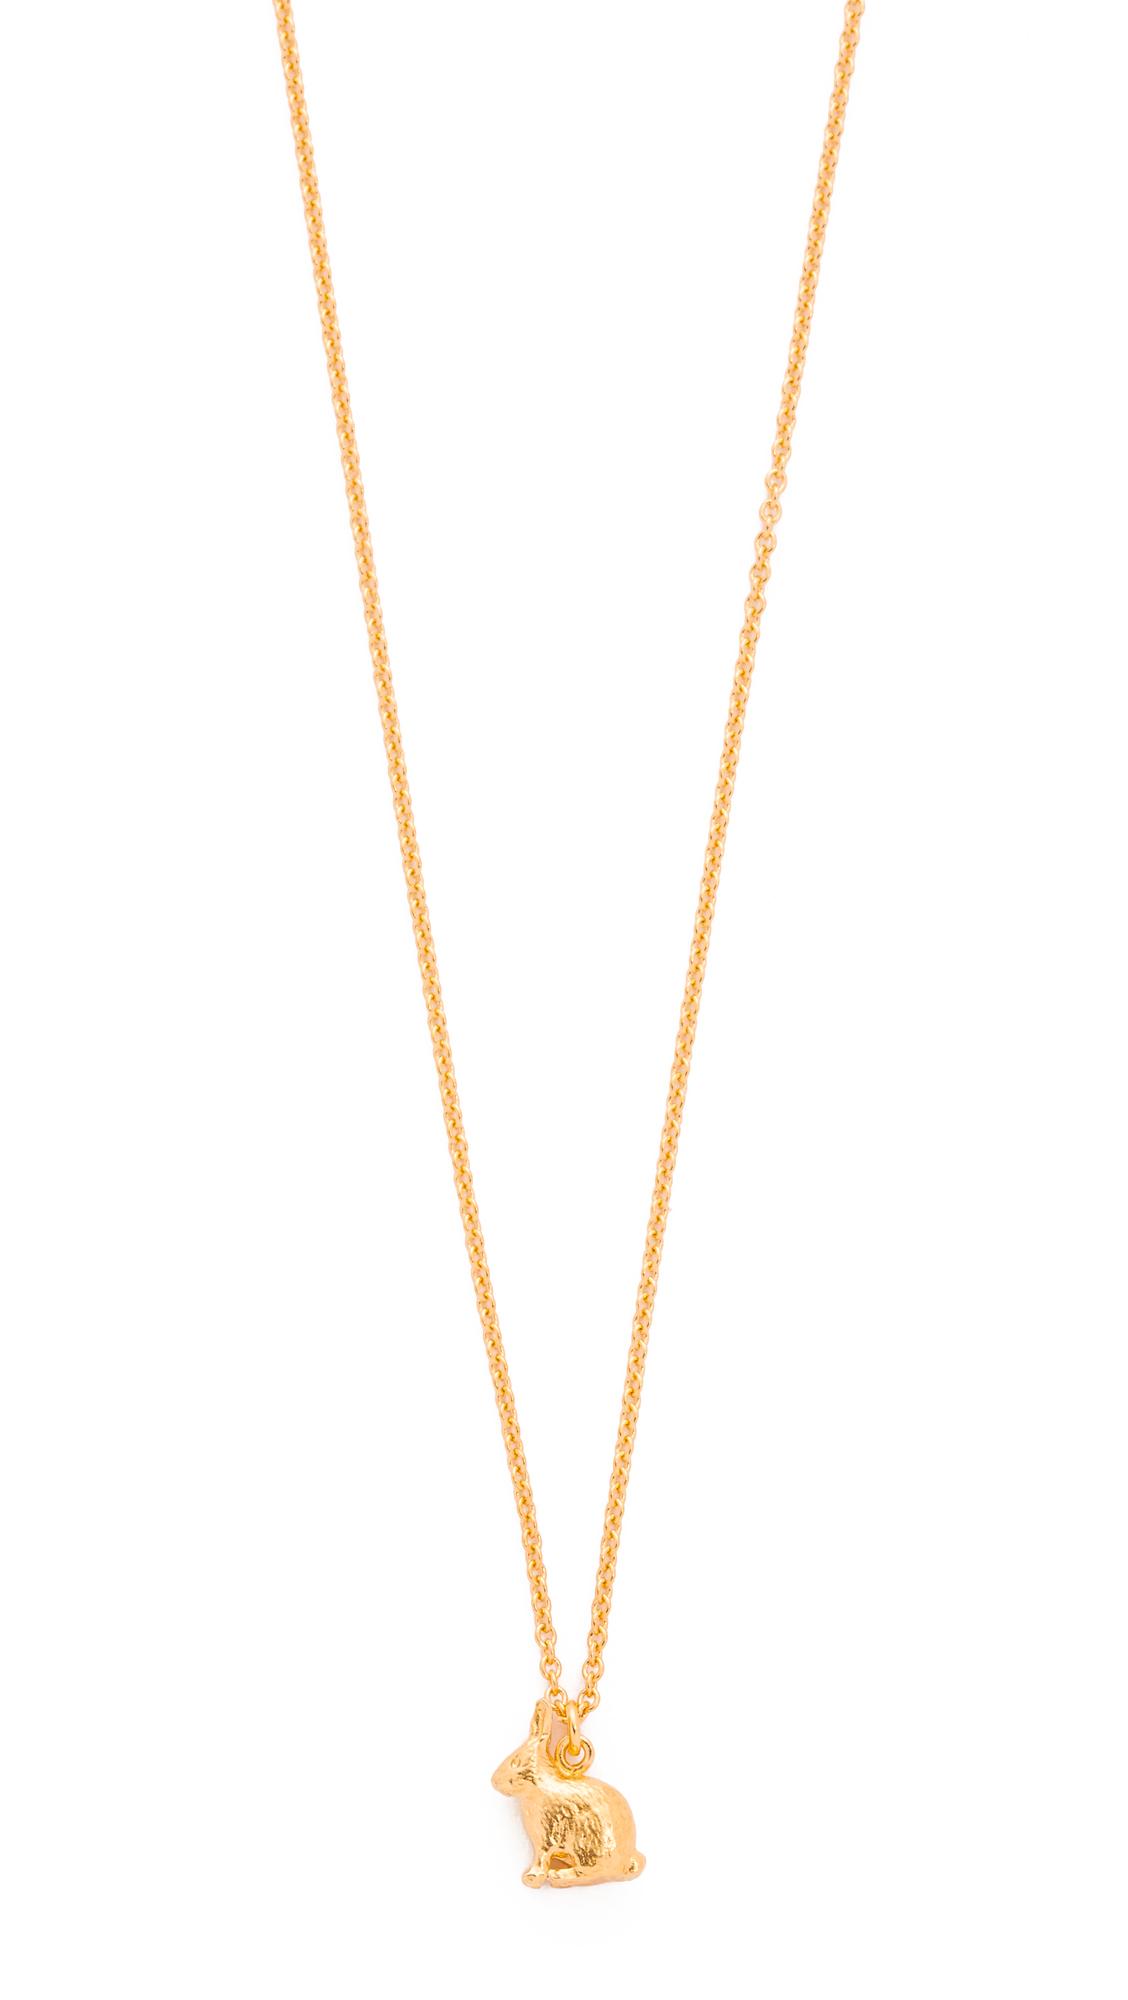 Alex monroe Sitting Bunny Necklace in Metallic